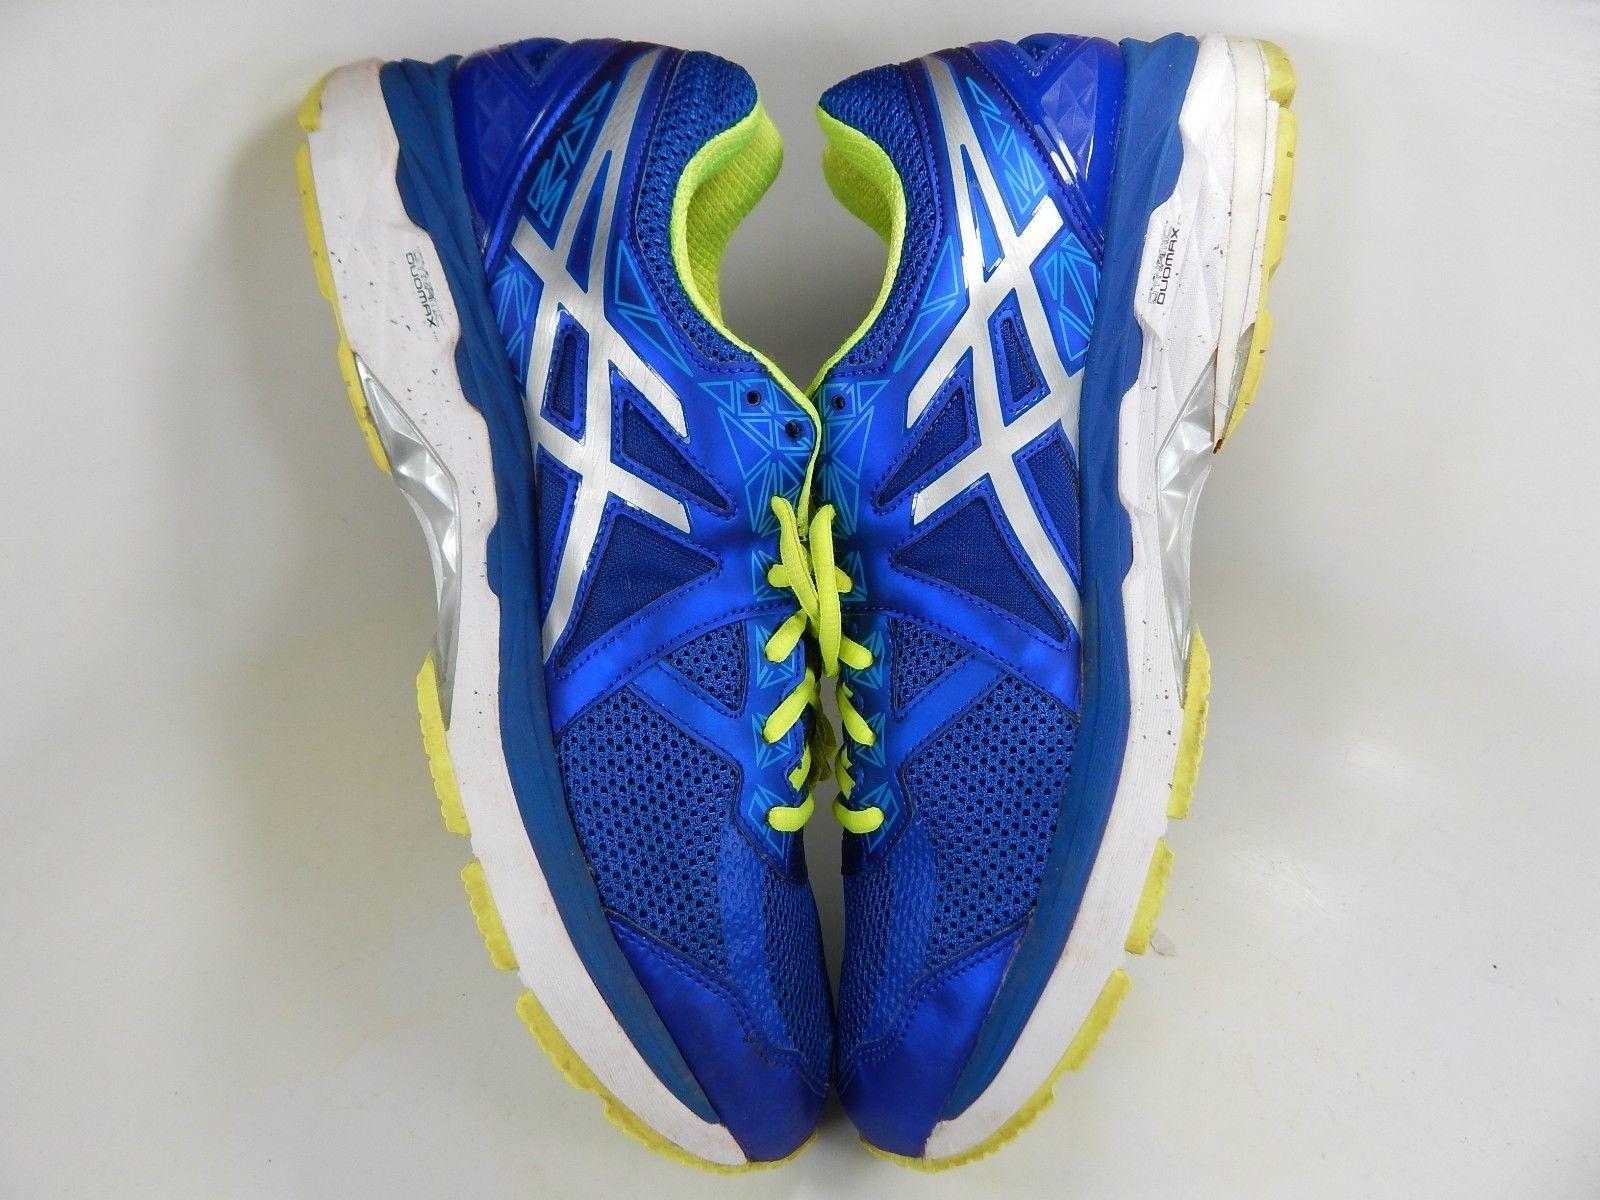 Asics GT 2000 v 4 Size: US 12.5 M (D) EU 47 Men's Running Shoes Blue T606N